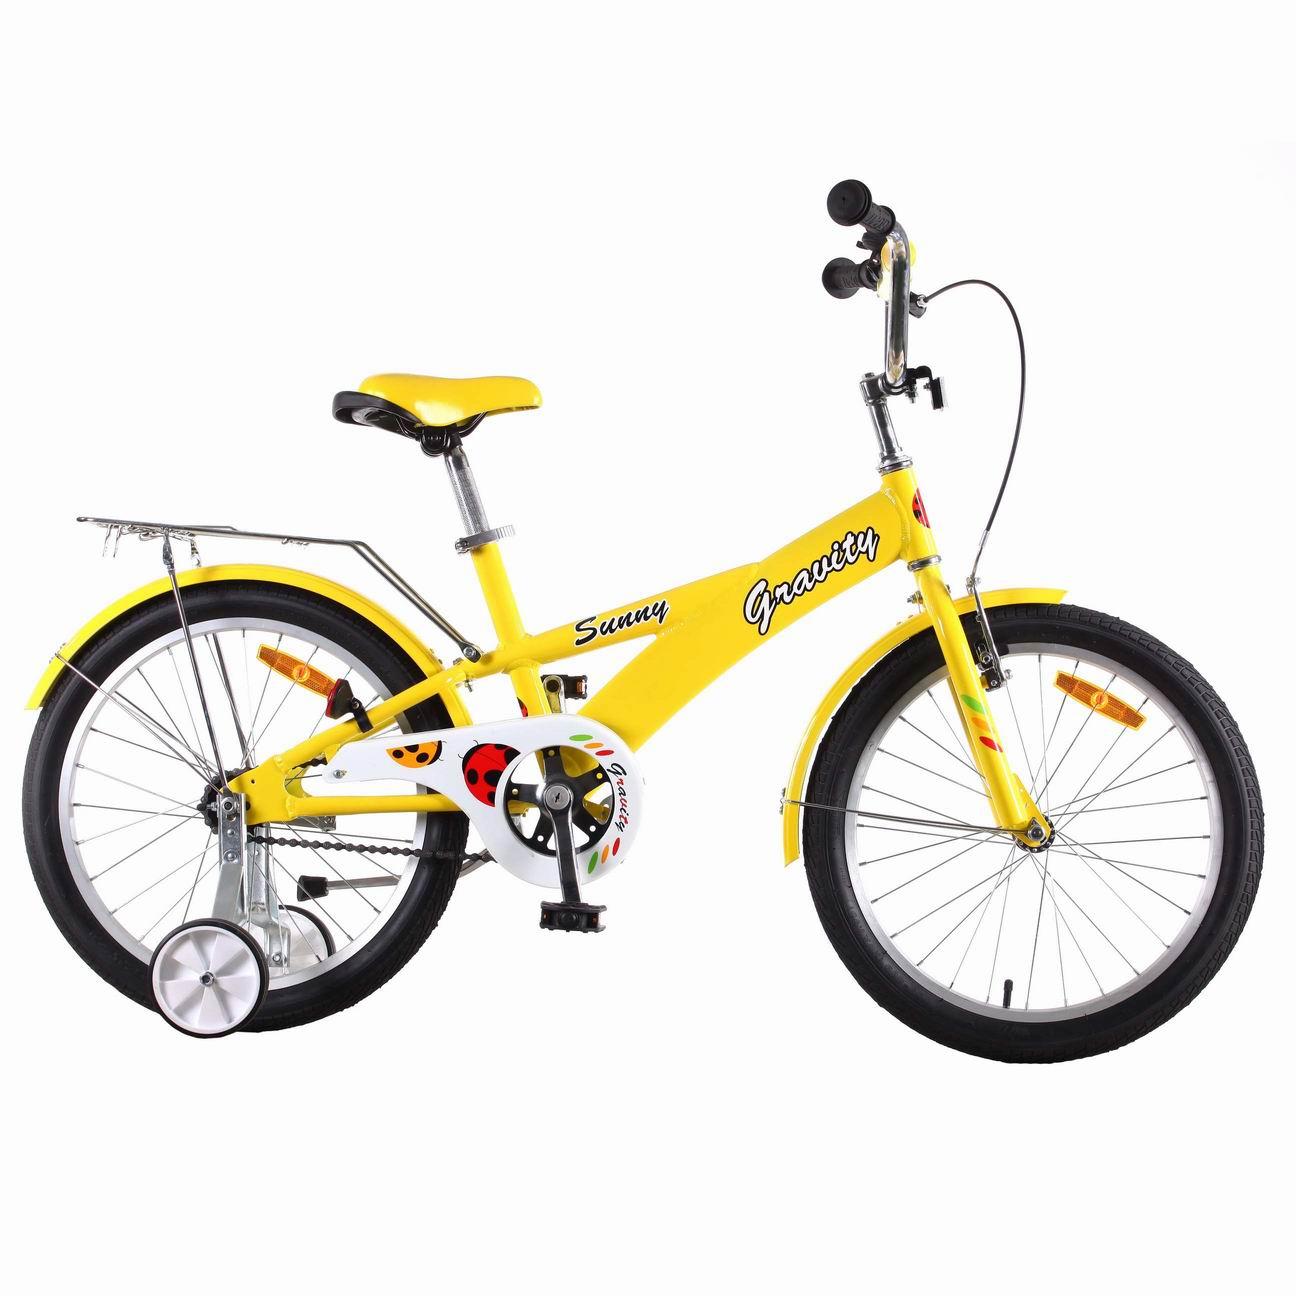 "Велосипед Gravity 20"" SUNNY желтый 1 скор. алюм.рама руч.торм. (7219-1) УЦЕНКА!!! 270917"